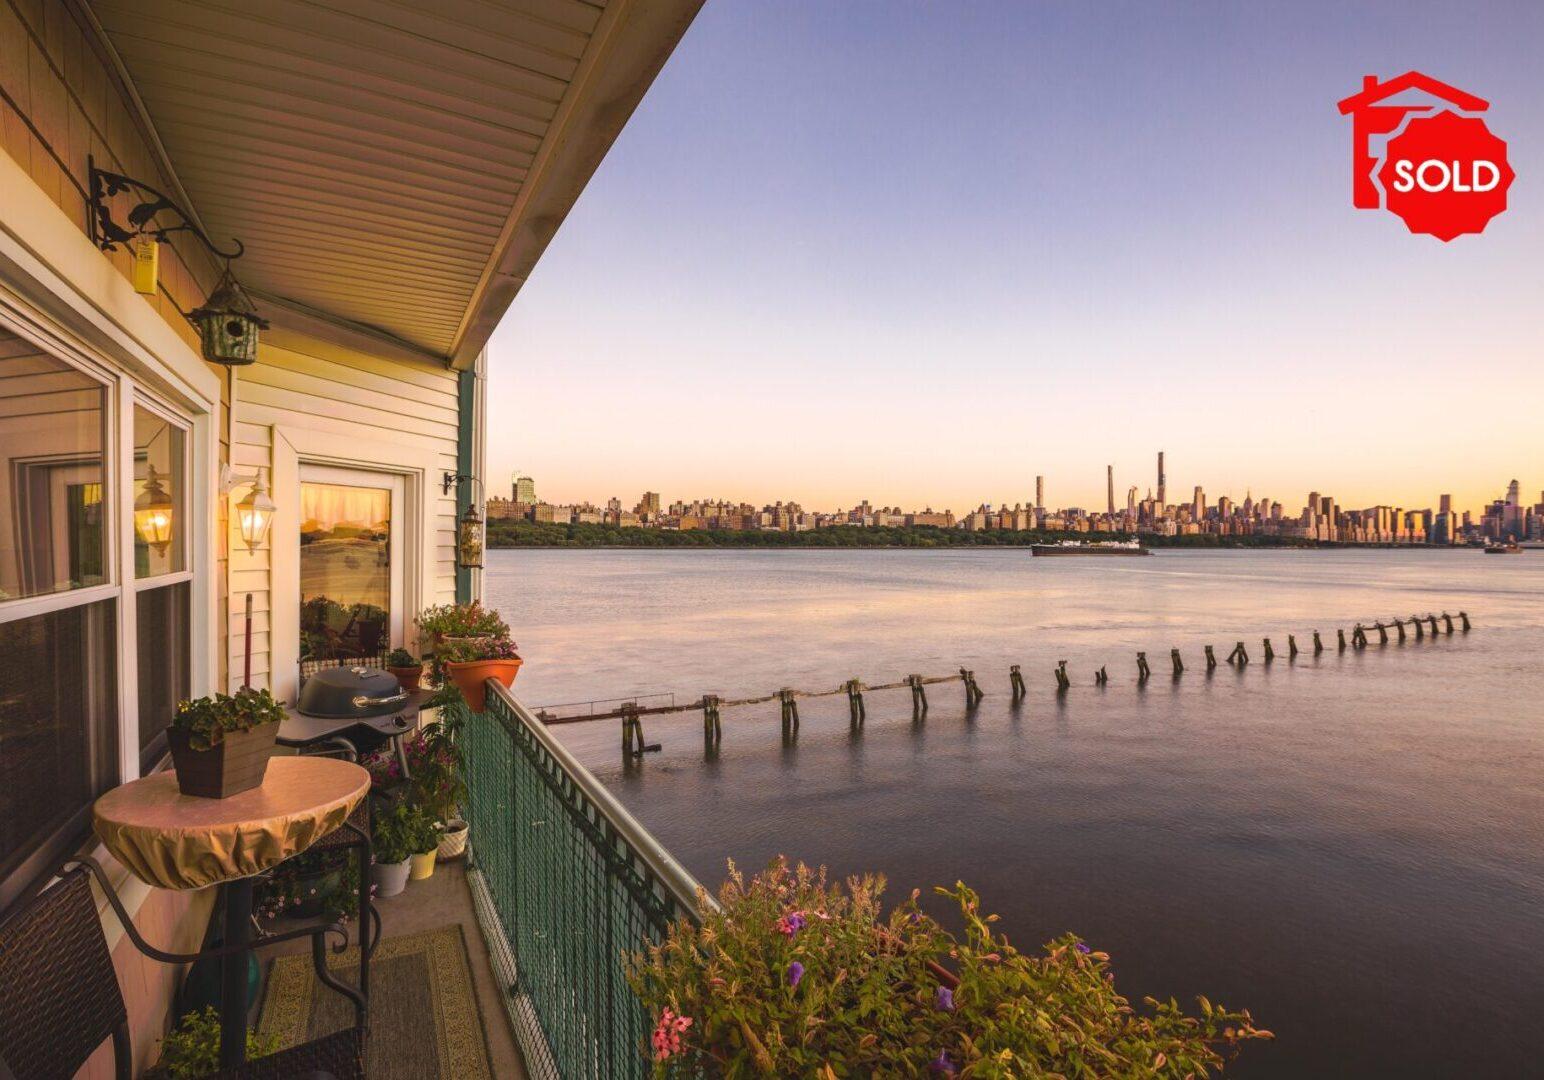 215 The Promenade Edgewater, NJ 07020 <br><br> $589,900 - Beds: 2 - Bath: 2